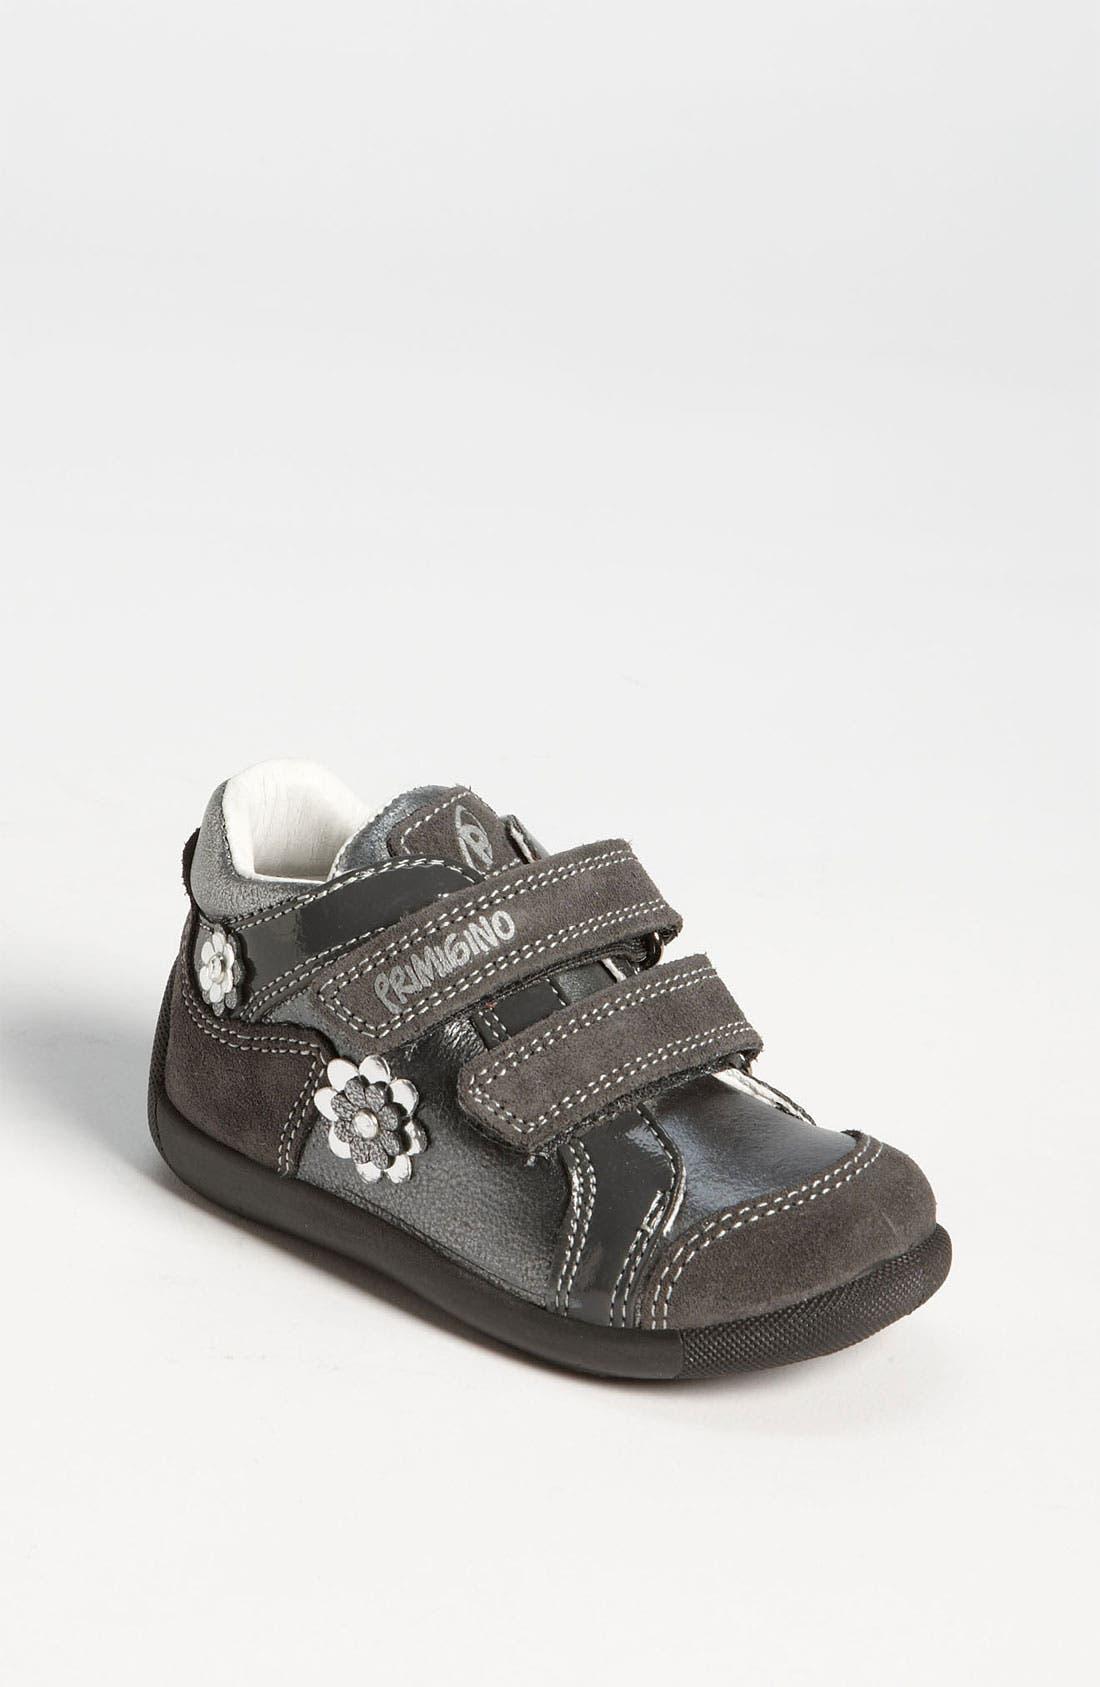 Alternate Image 1 Selected - Primigi 'Simona' Sneaker (Baby, Walker & Toddler)